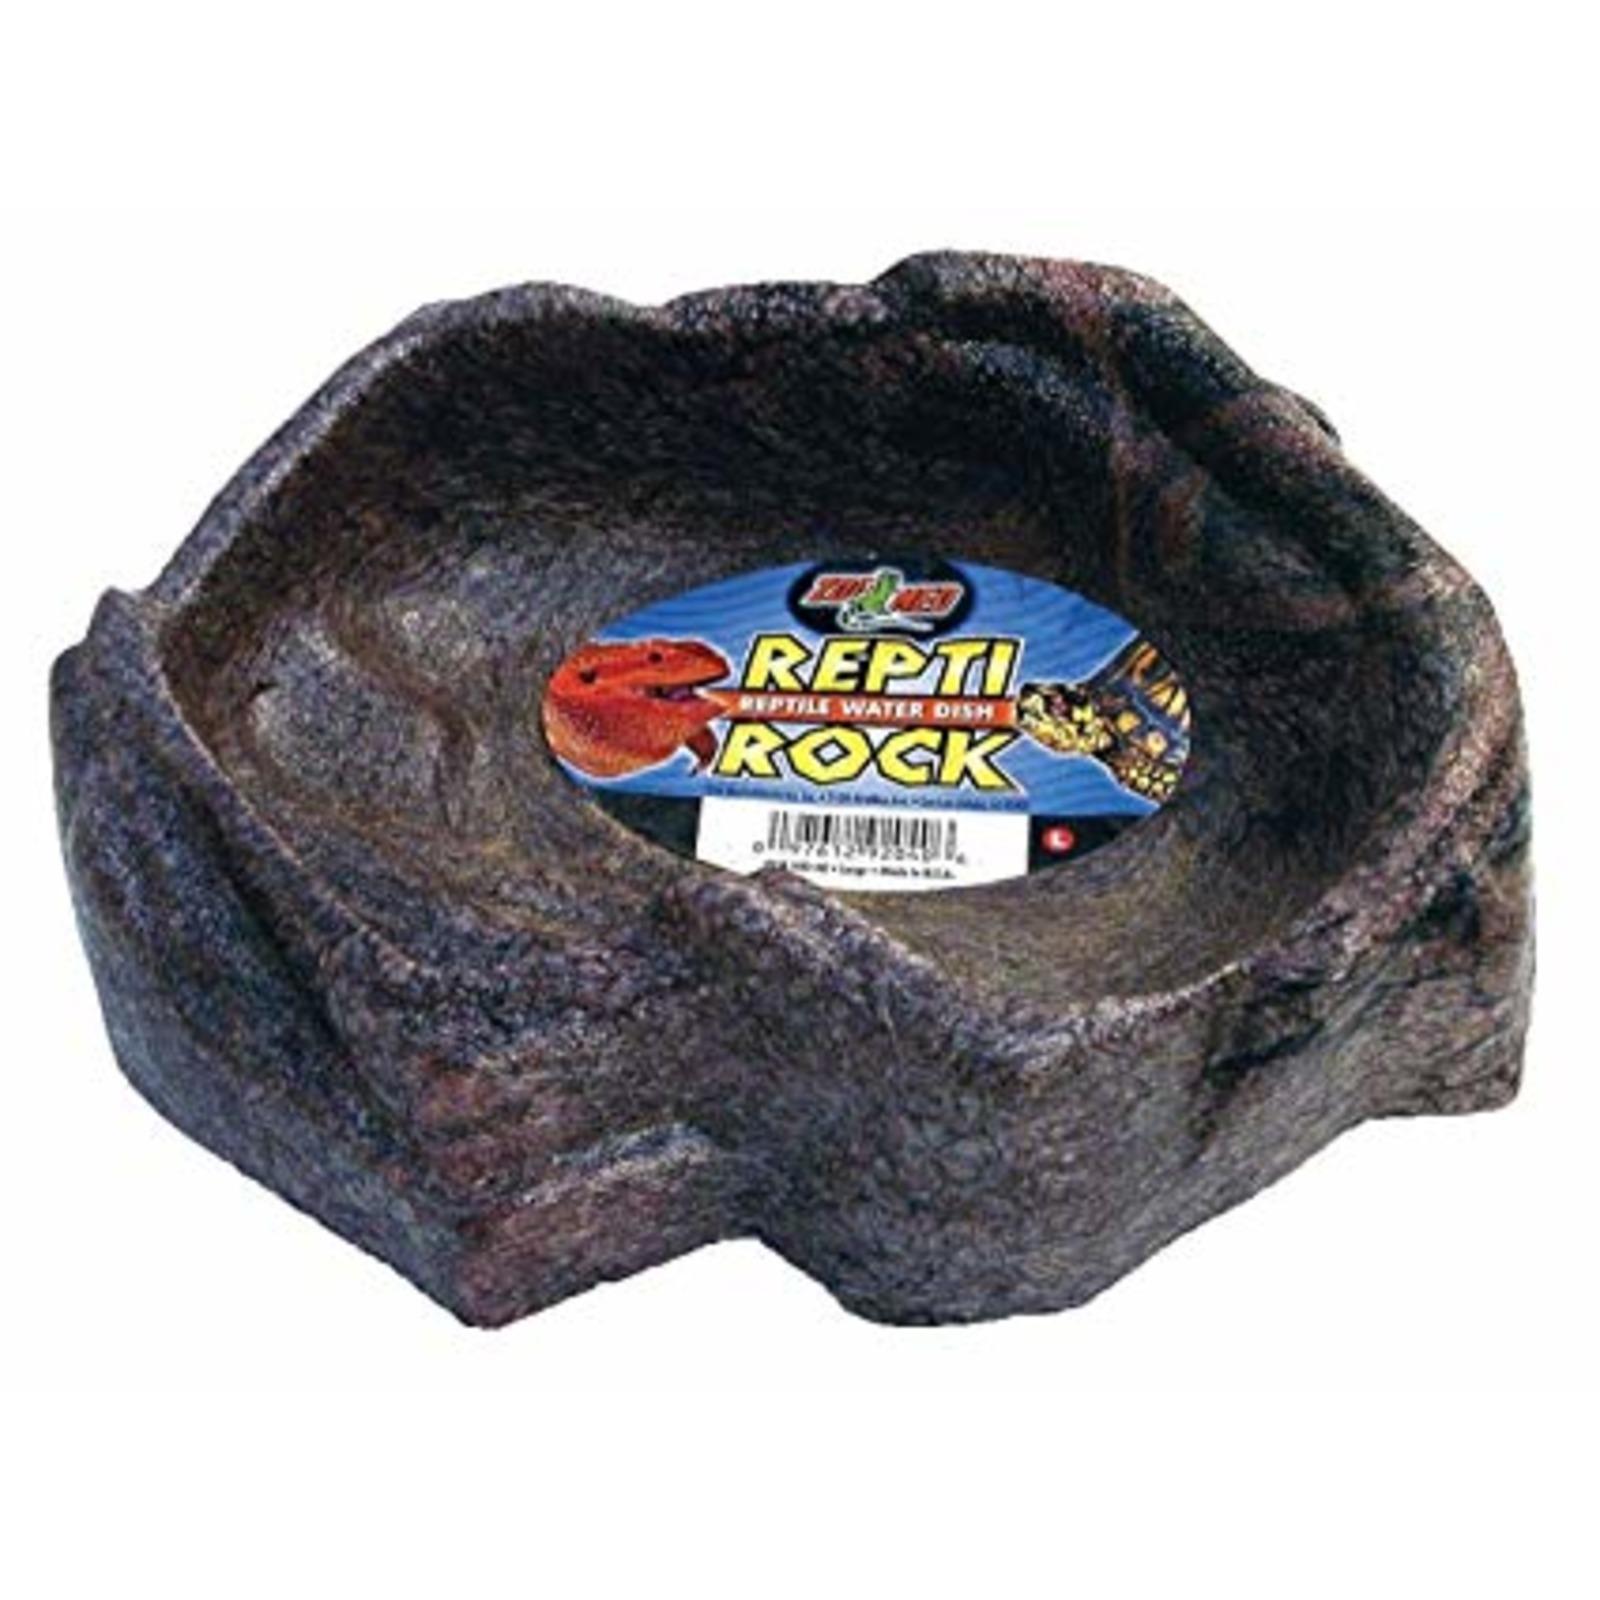 Zoo Med Repti Rock Water Dish LG